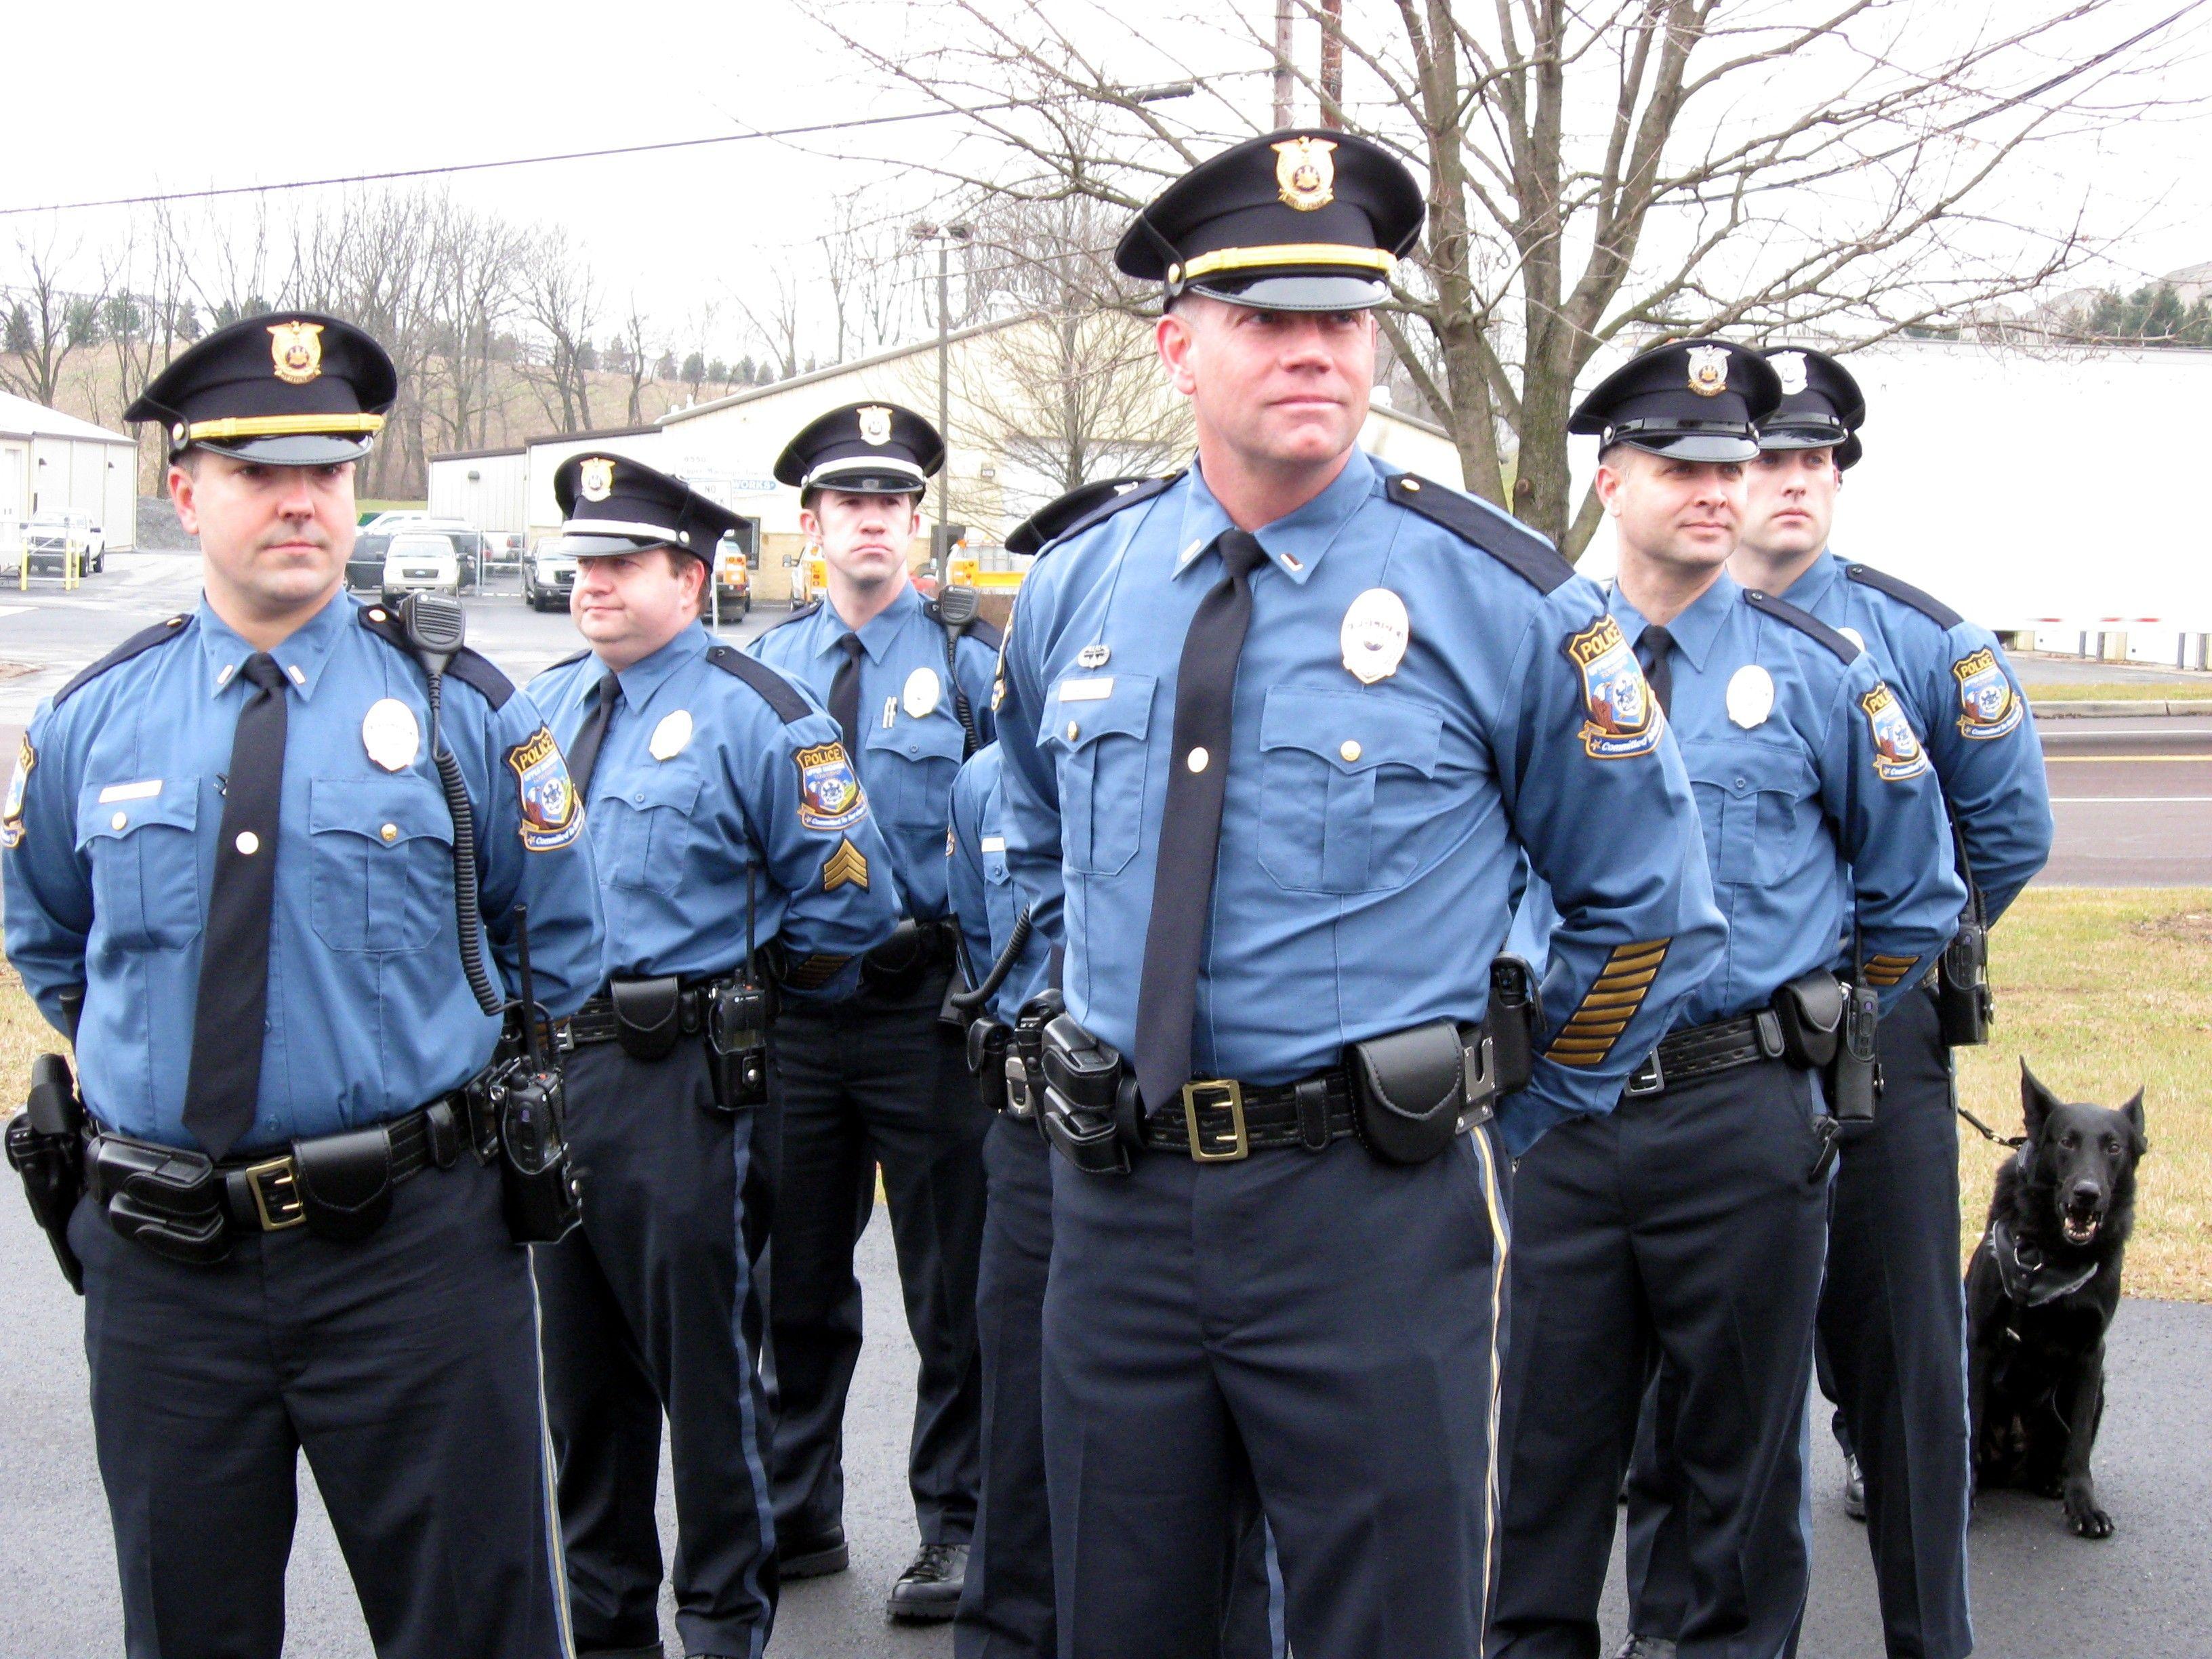 american police uniform contemporary military police